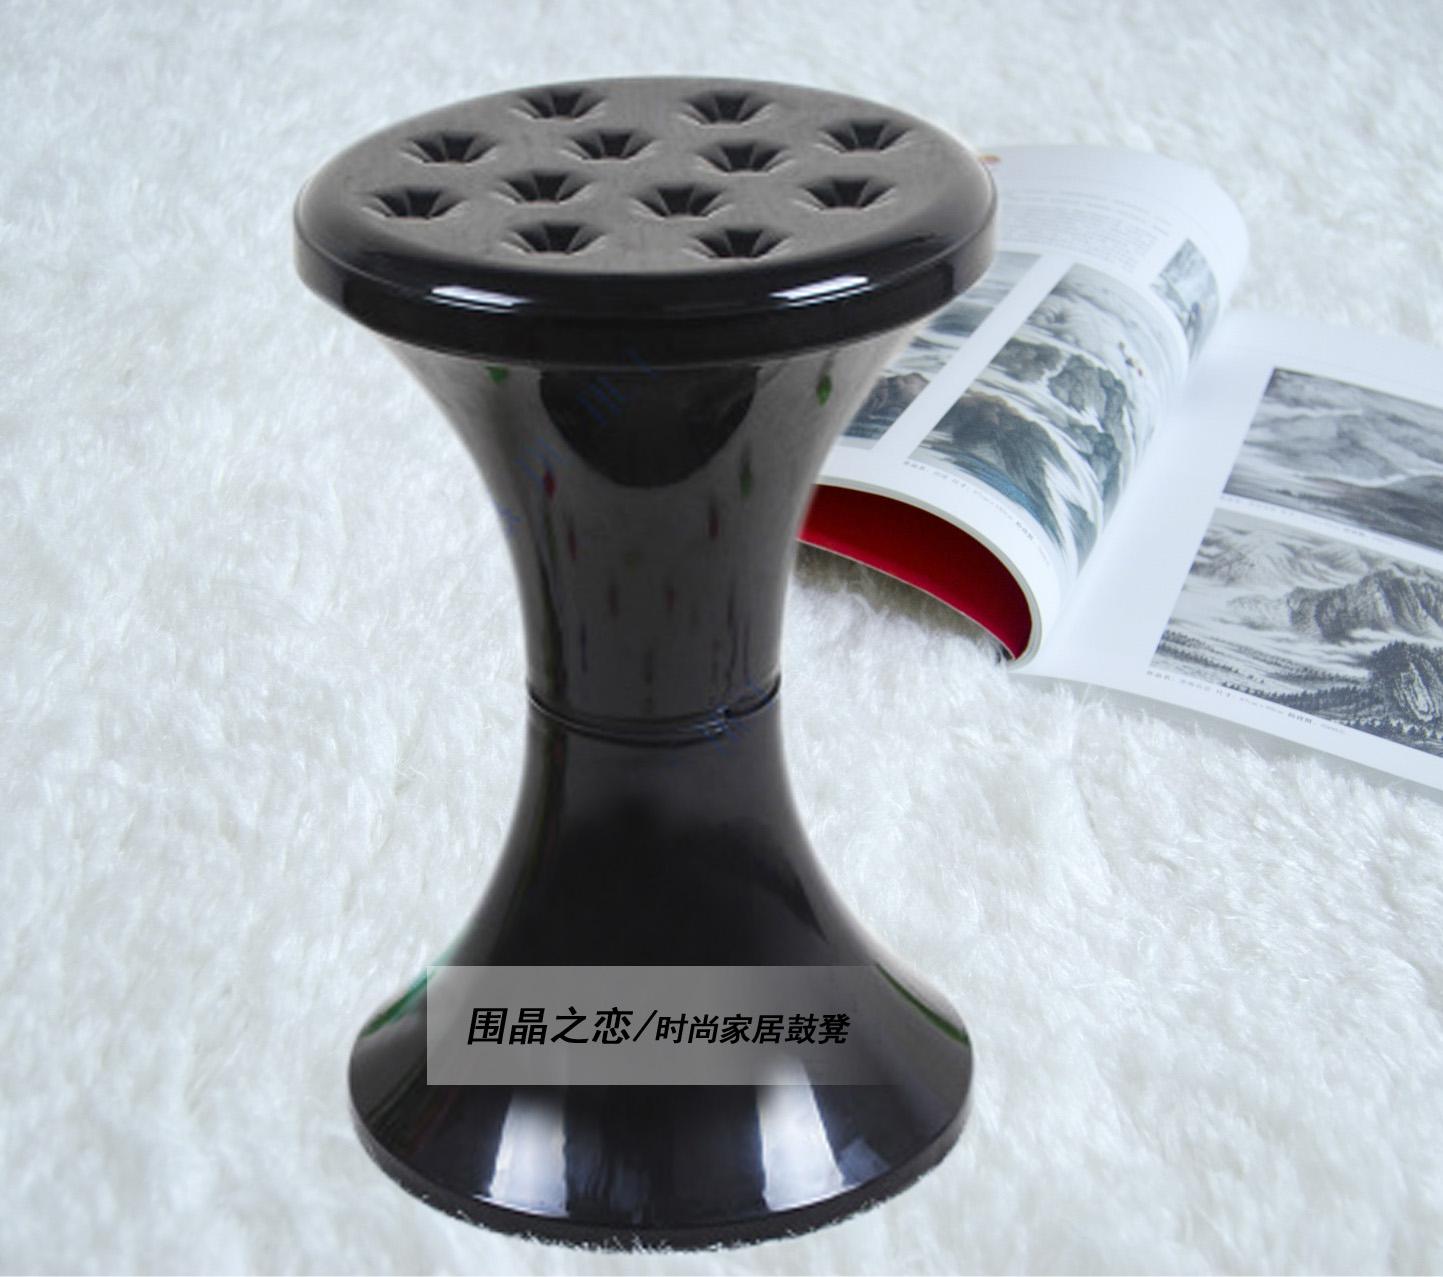 Складные стулья Артикул 537001344636